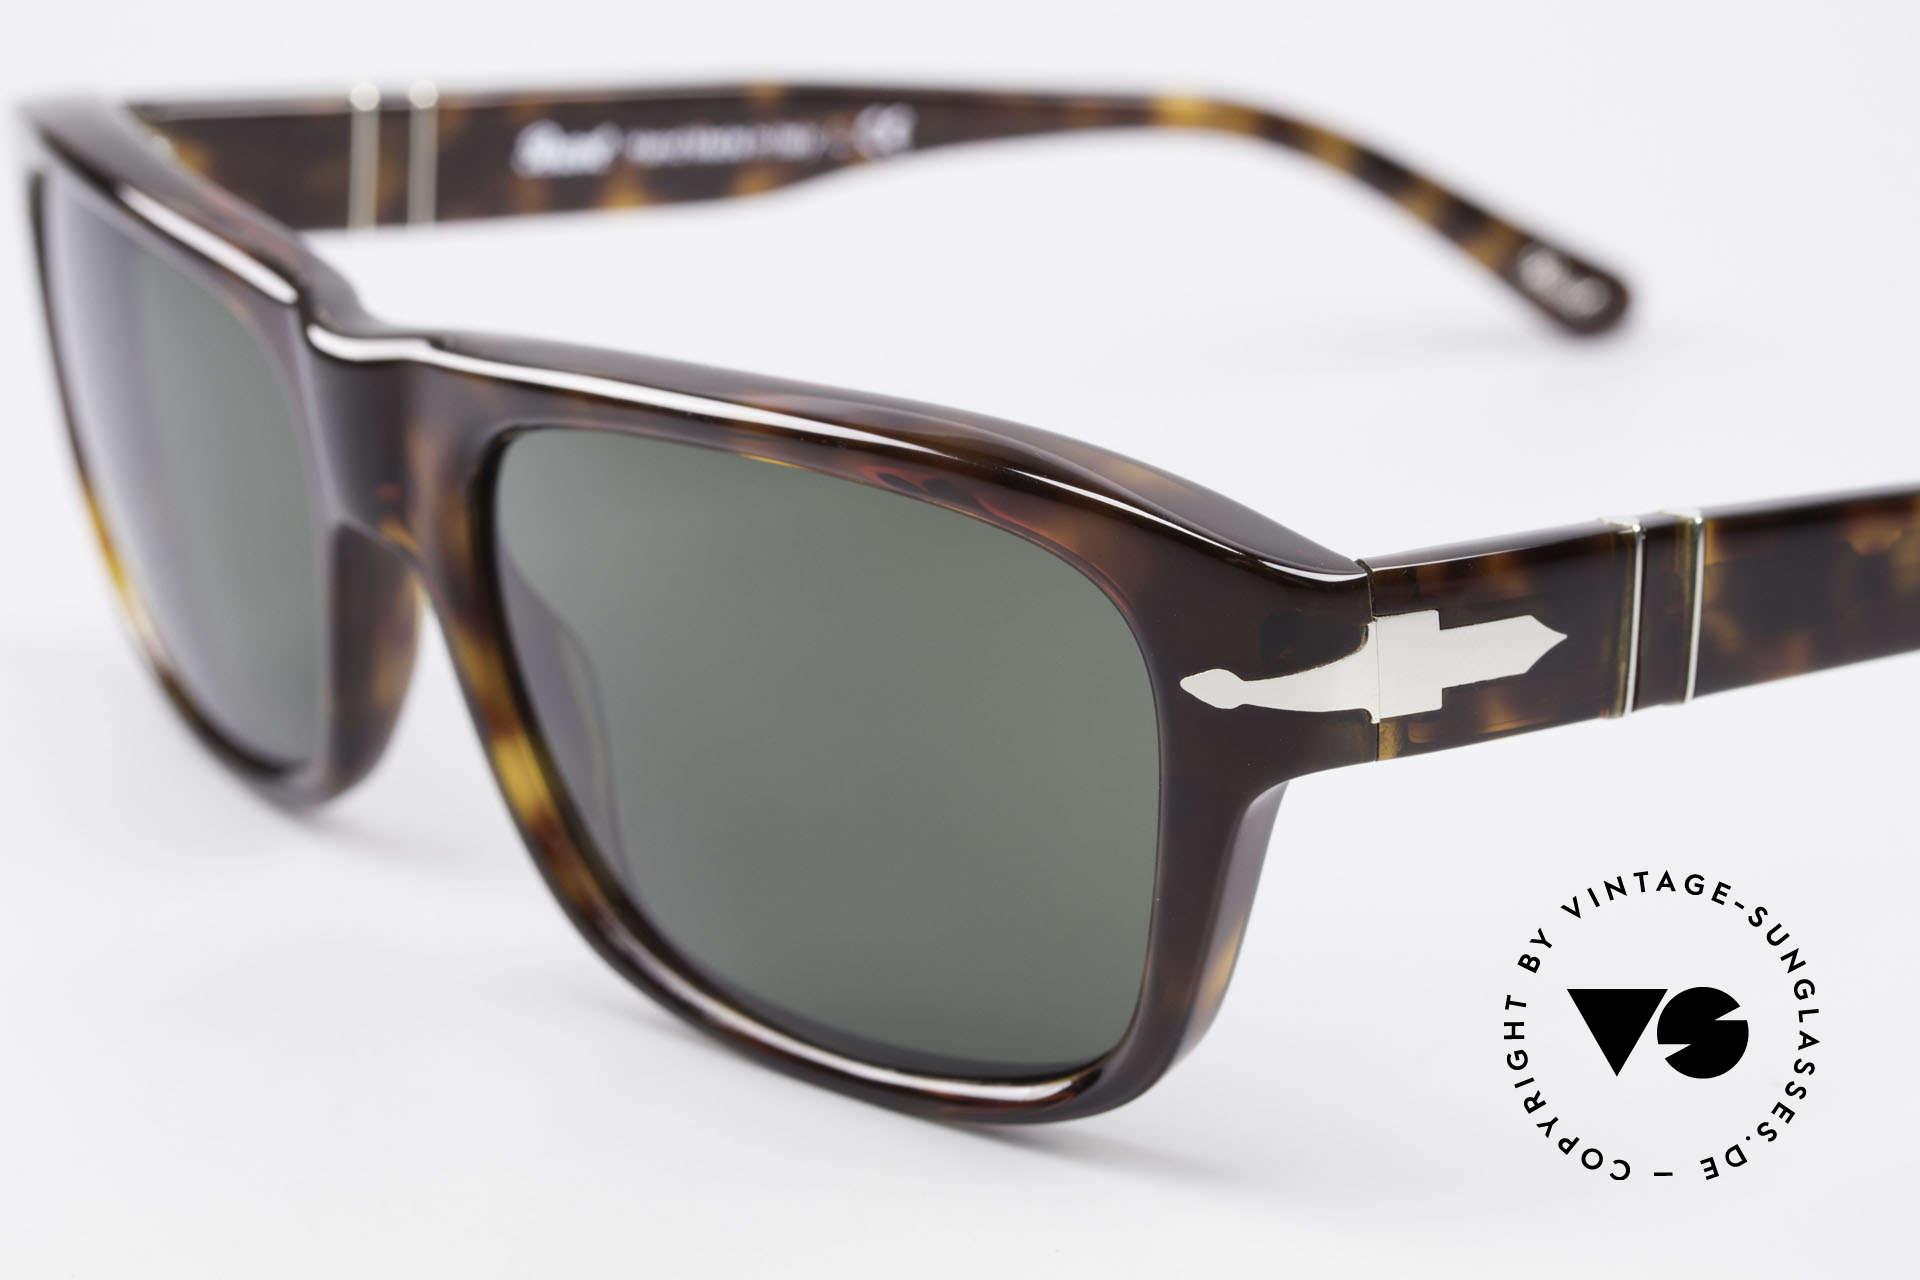 Persol 3001 Classic Men's Sunglasses, unworn (like all our classic PERSOL sunglasses), Made for Men